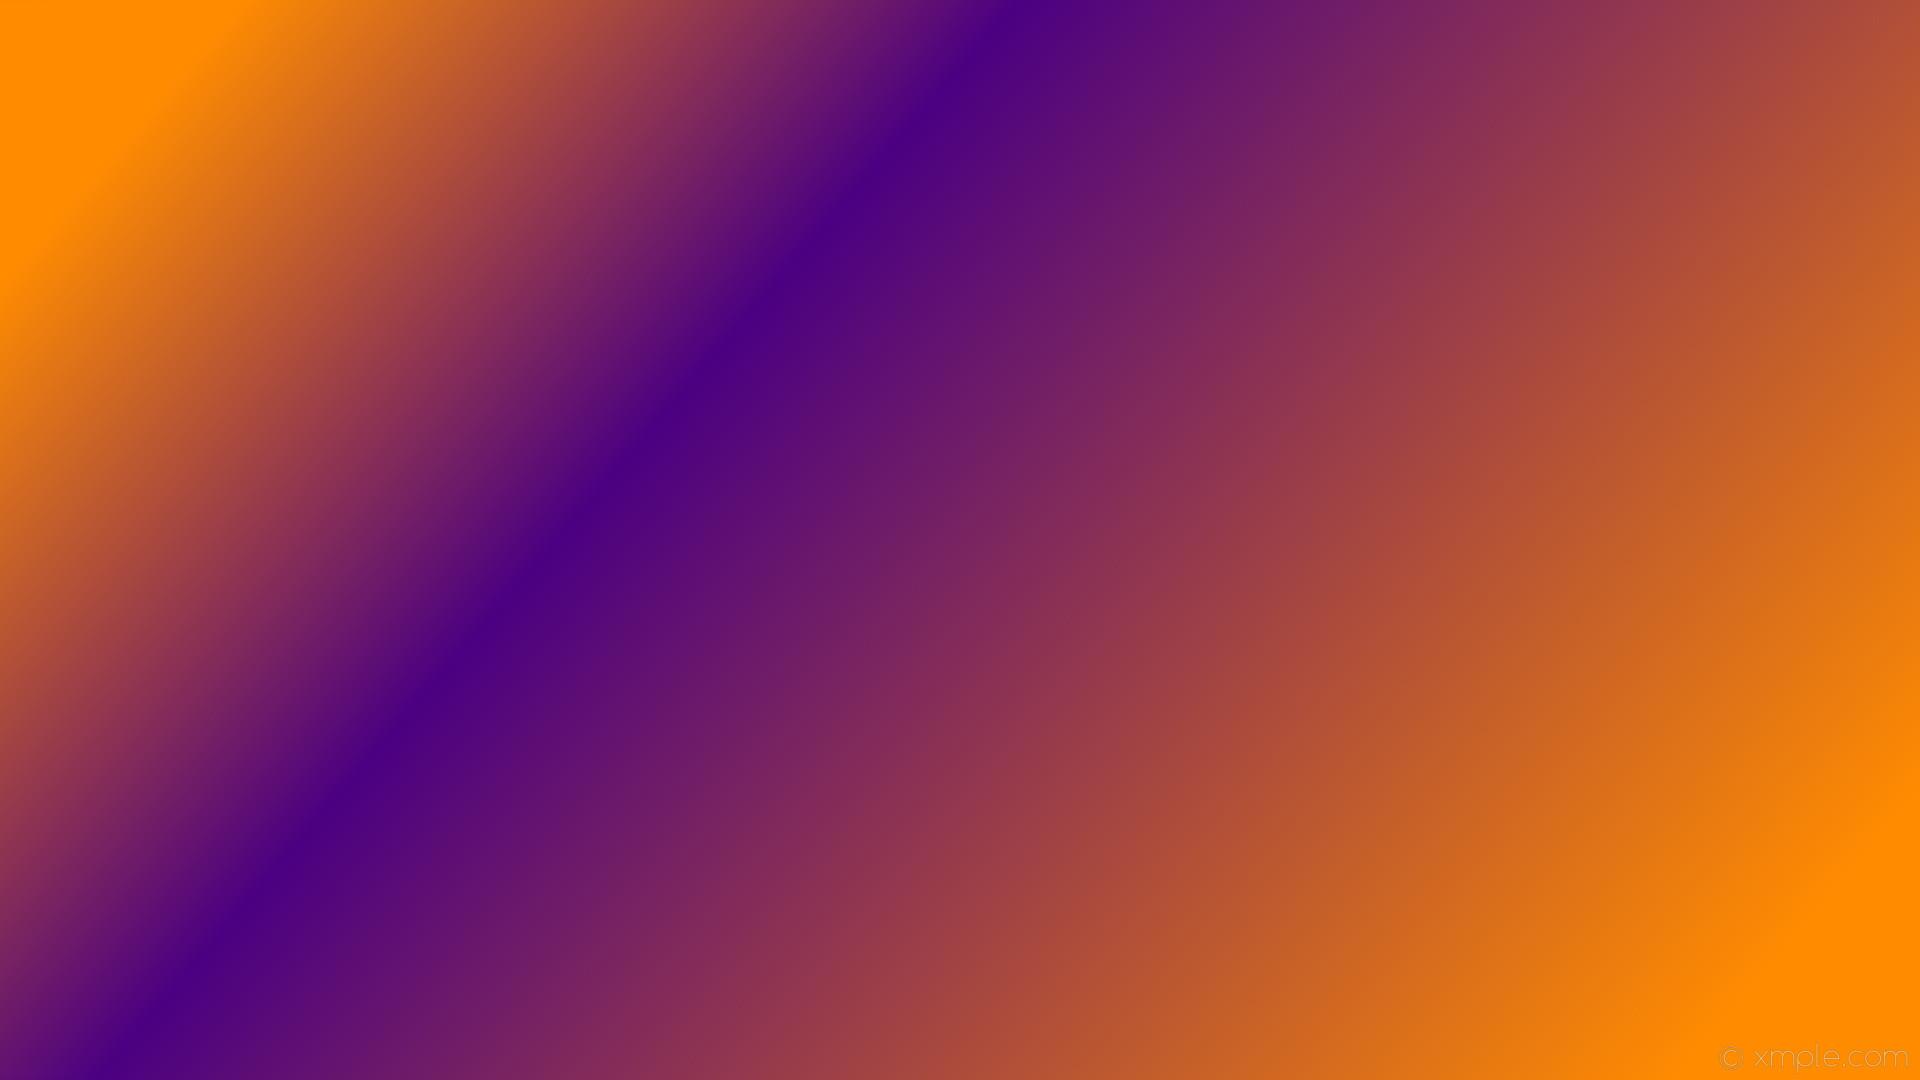 wallpaper highlight linear gradient purple orange dark orange indigo  #ff8c00 #4b0082 165° 33